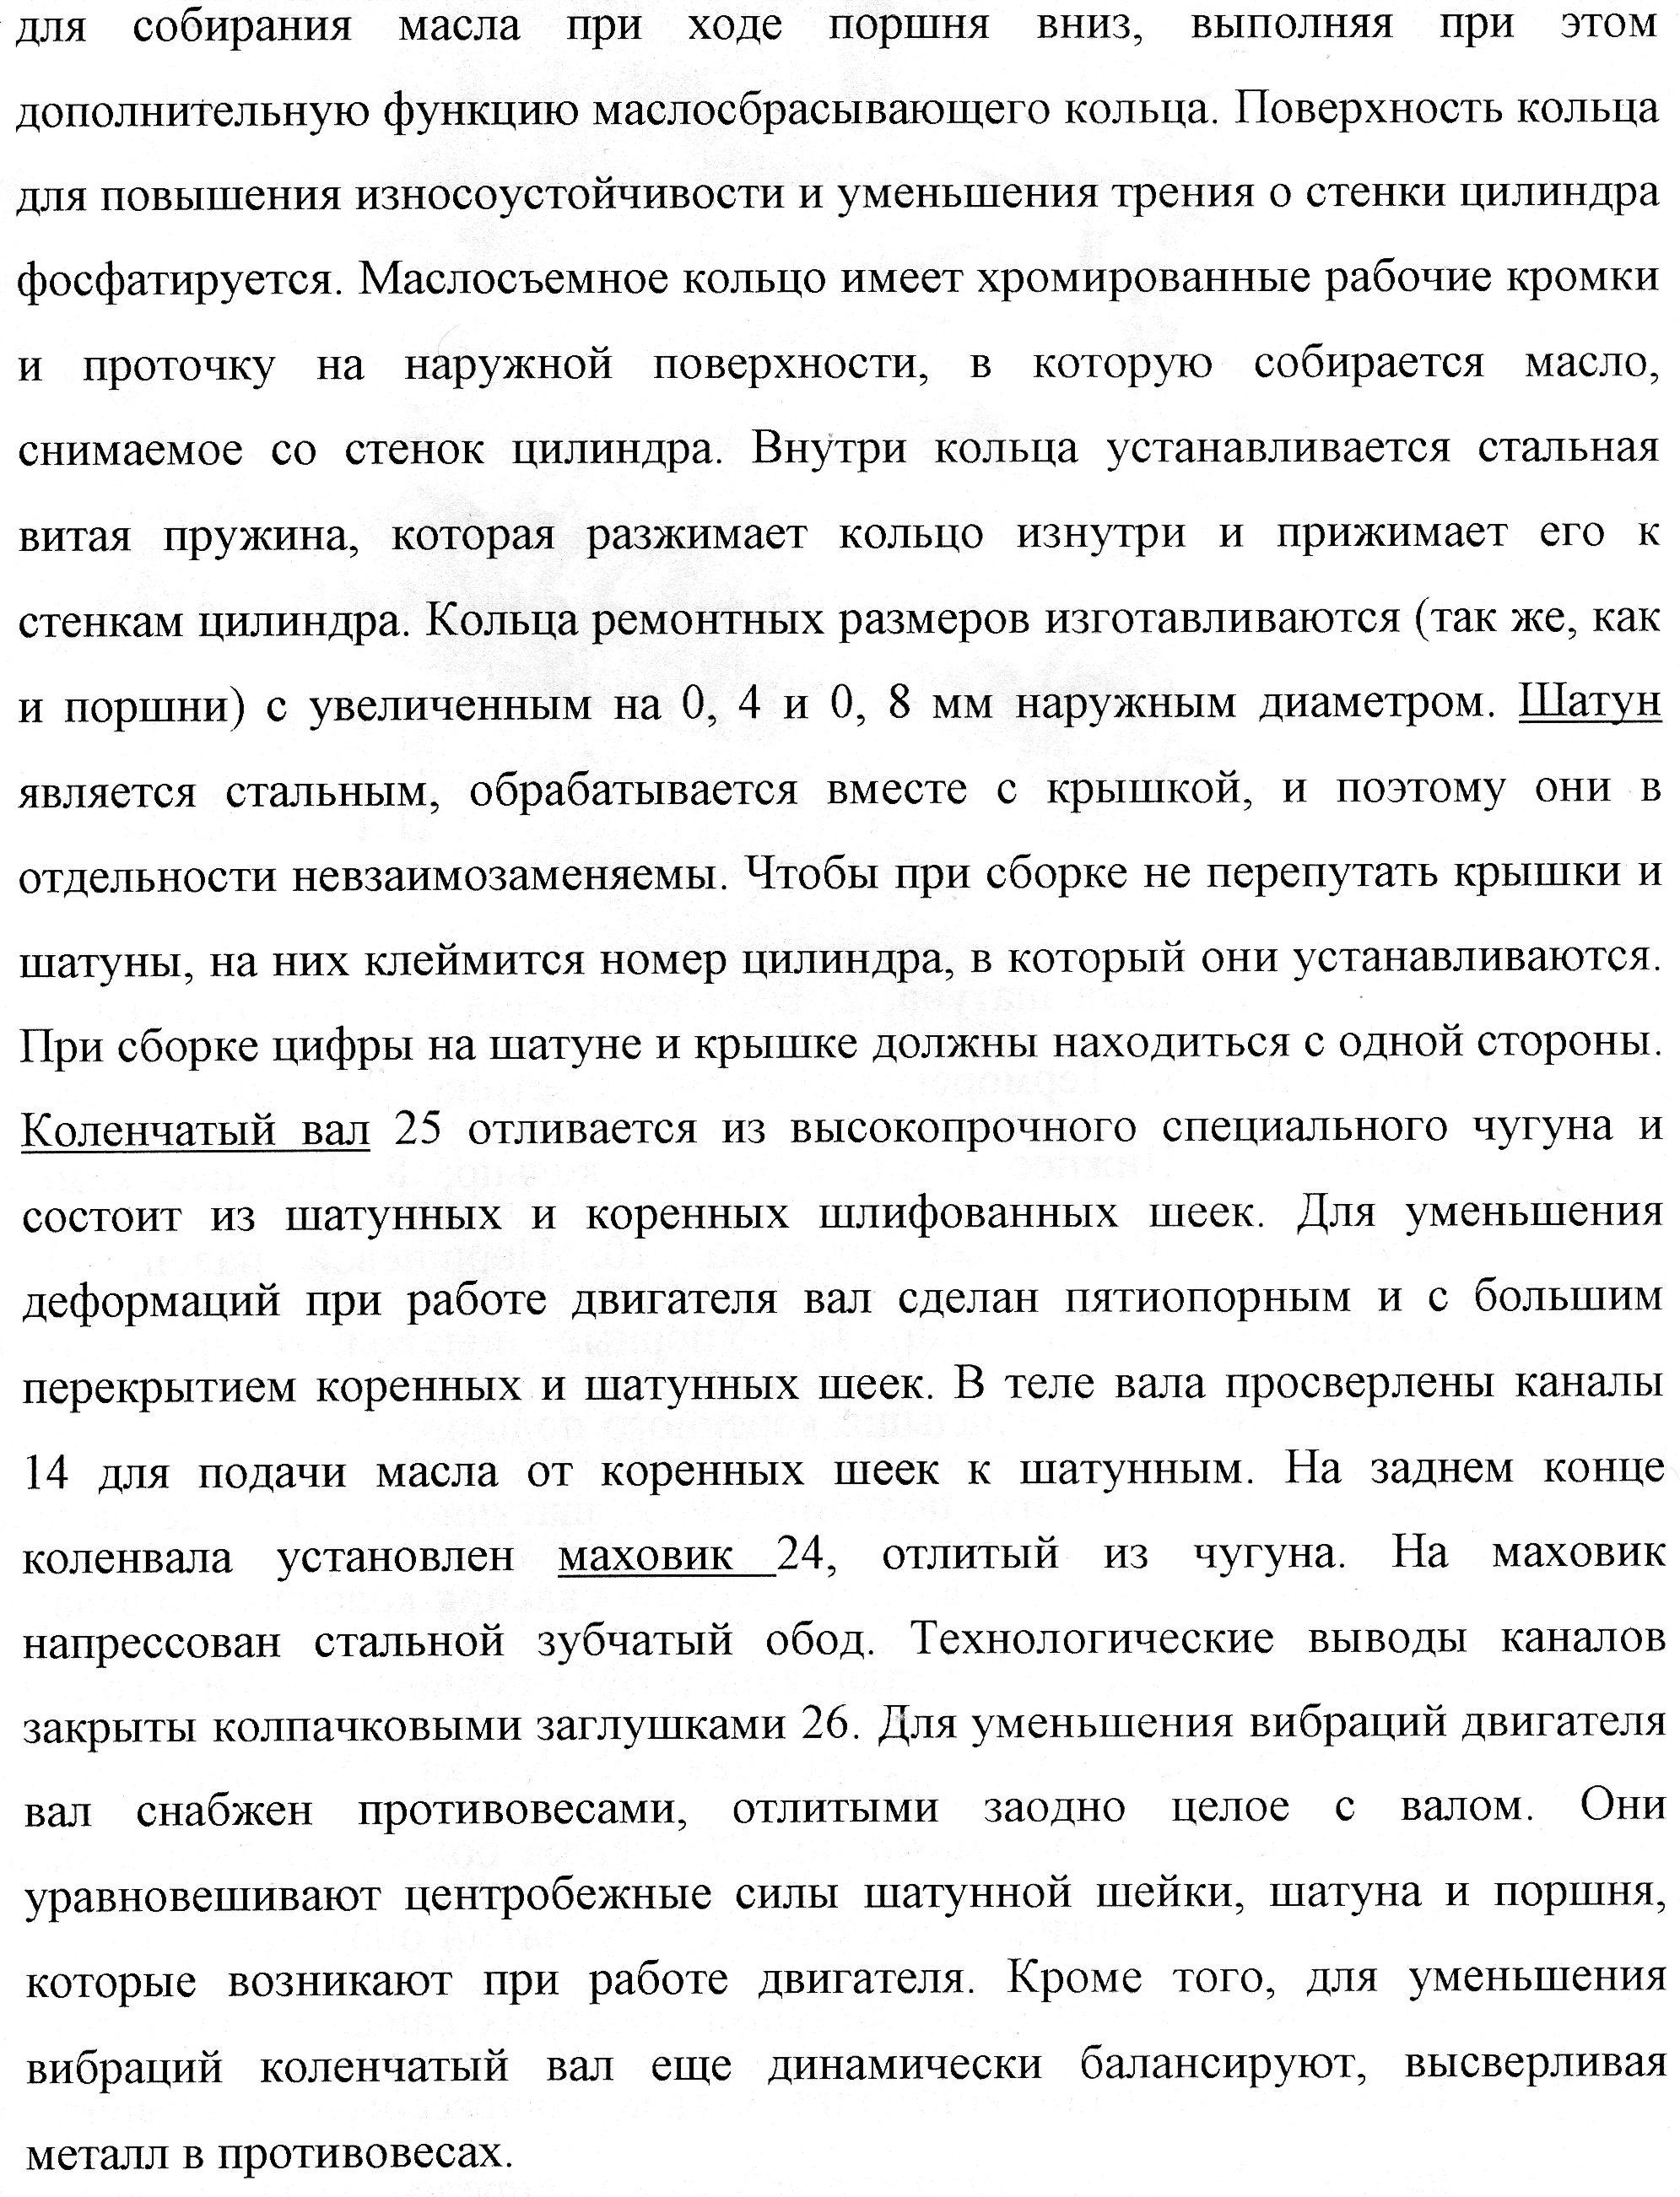 C:\Users\Василий Мельченко\Pictures\img595.jpg